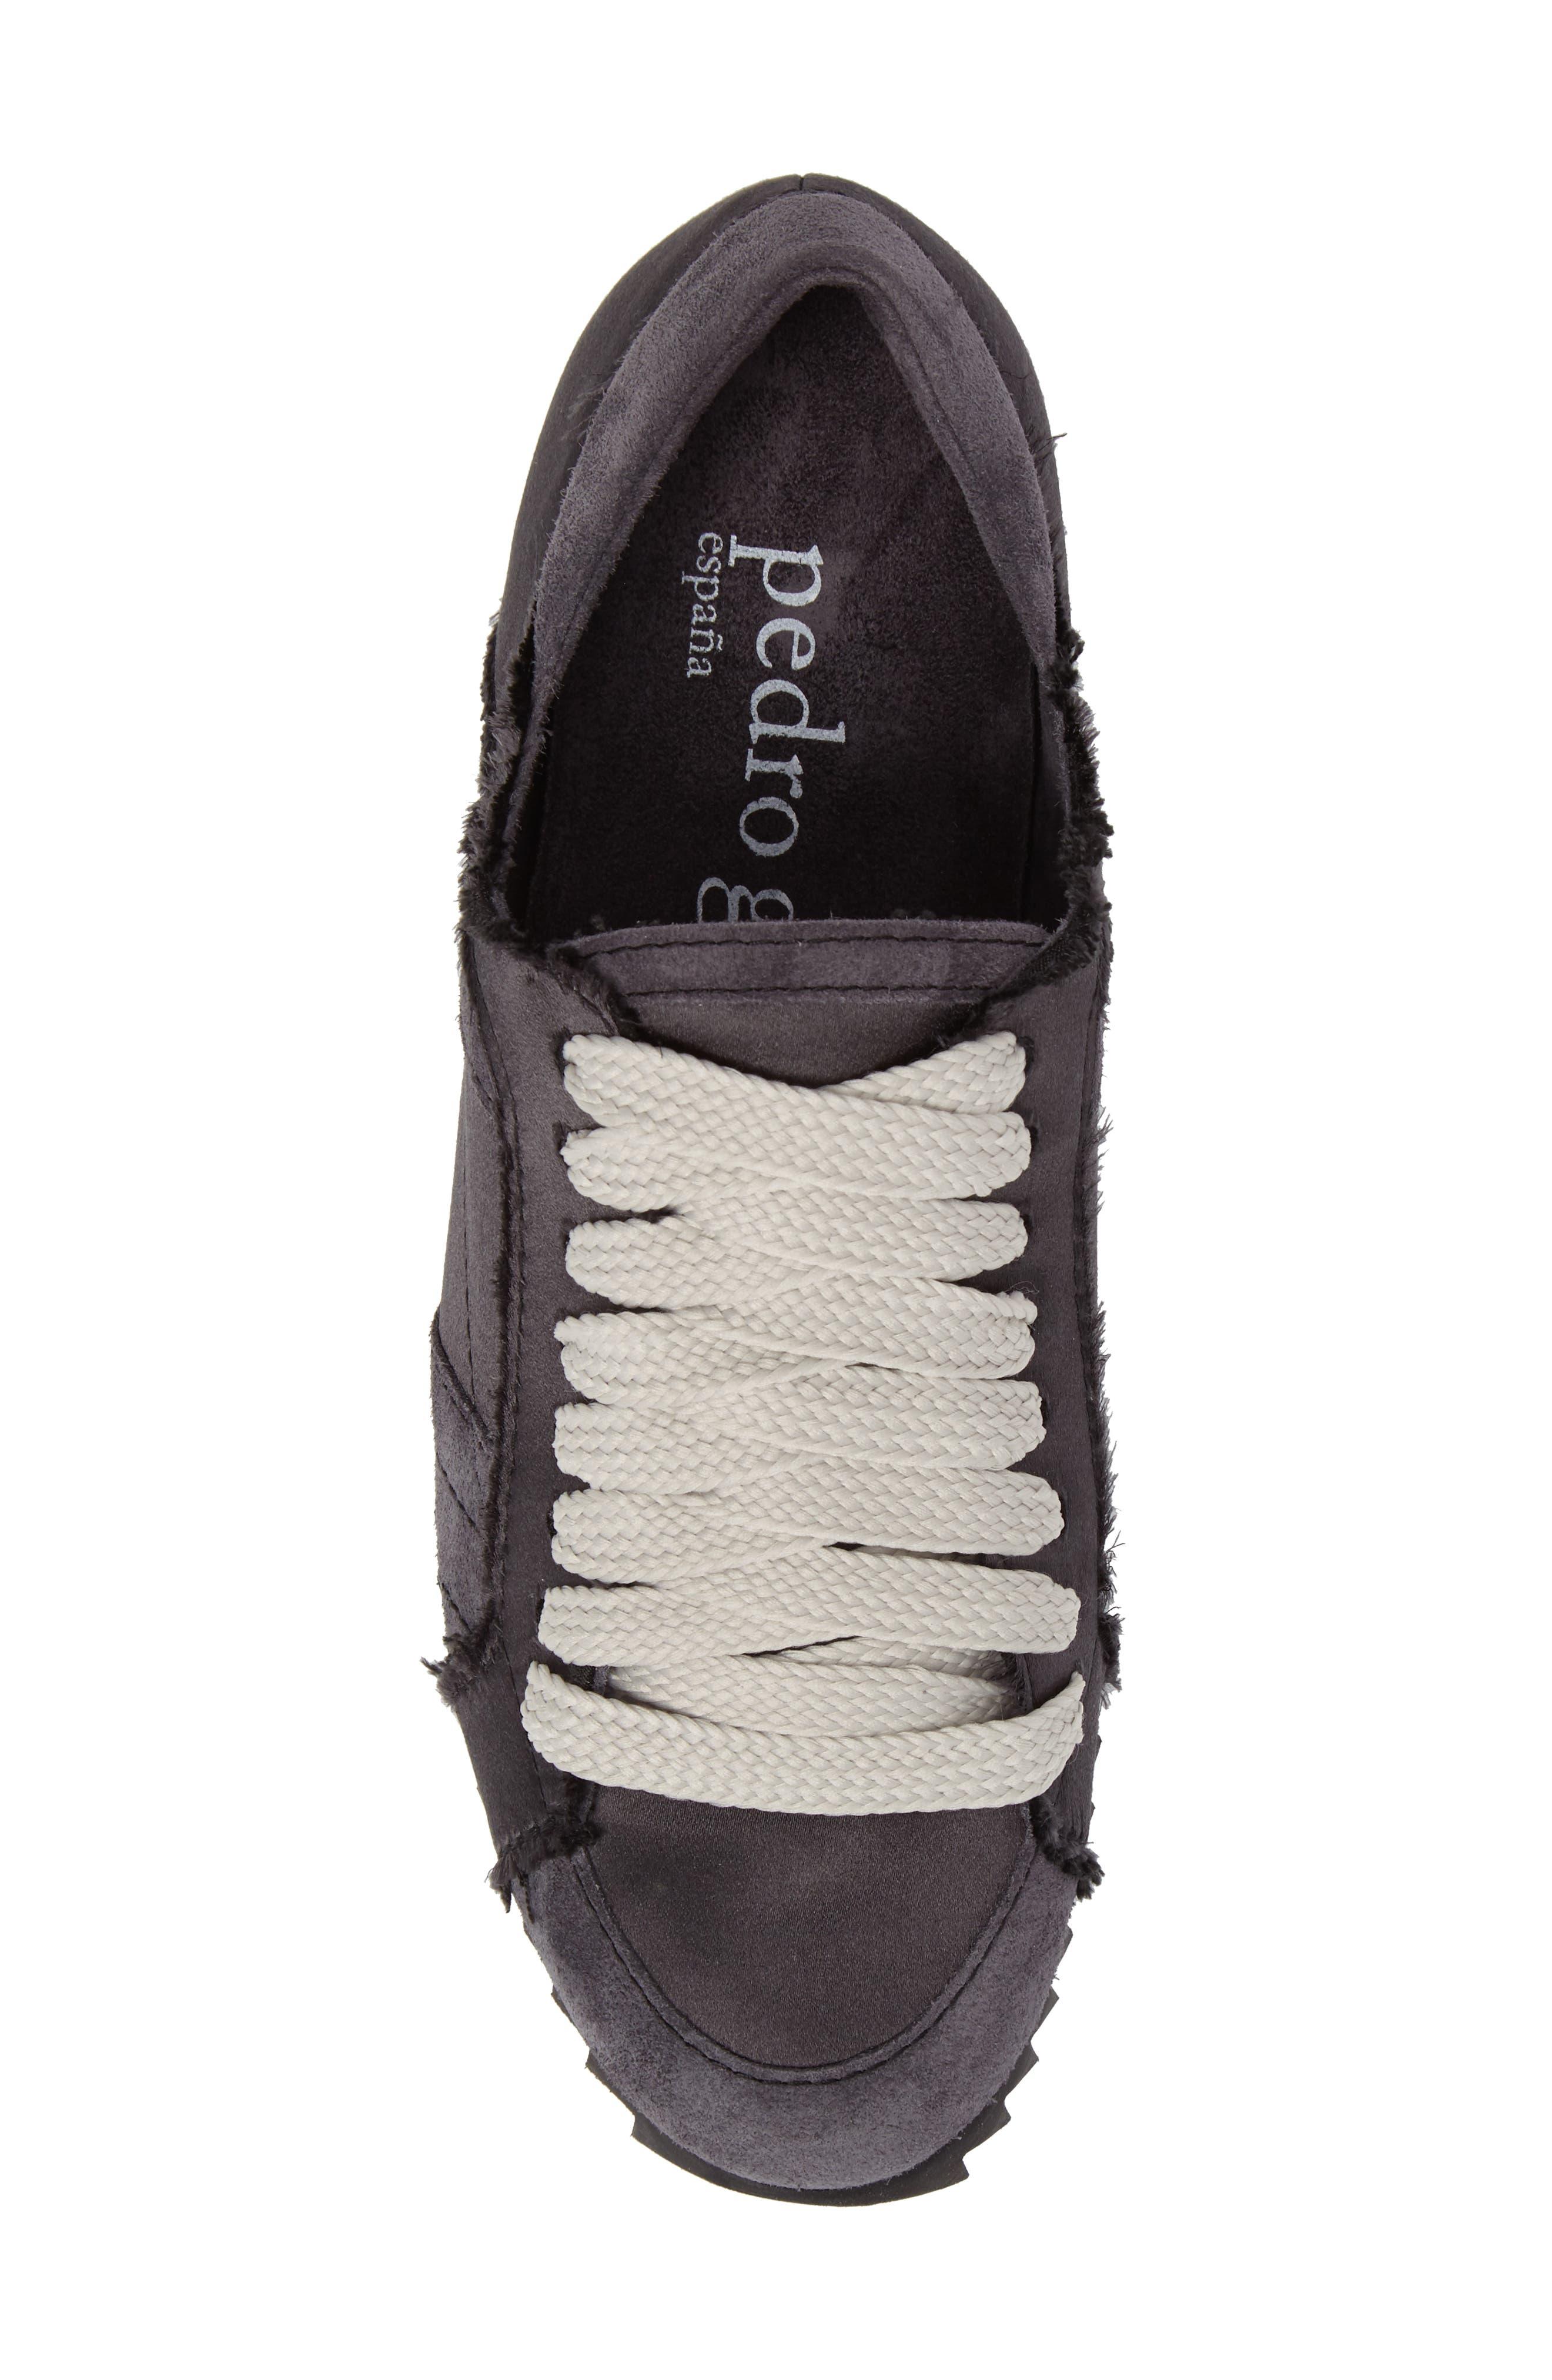 Cristina Trainer Sneaker,                             Alternate thumbnail 5, color,                             001